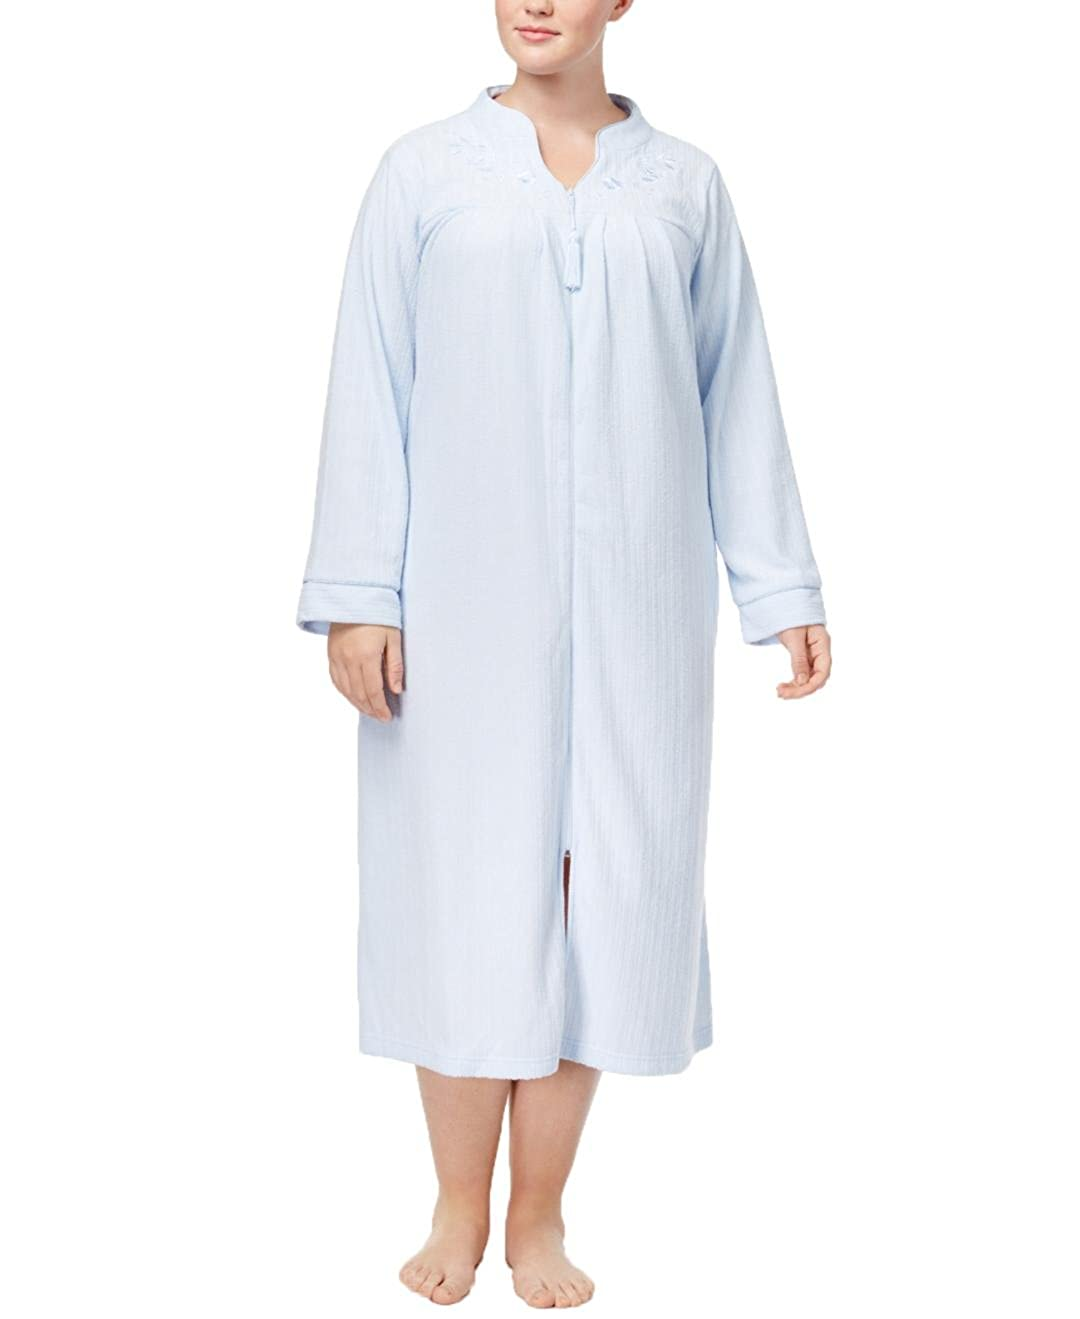 e1f1c7ff7a Miss Elaine Womens Plus Size Brushed Back Terry Long Zipper Robe 861006X